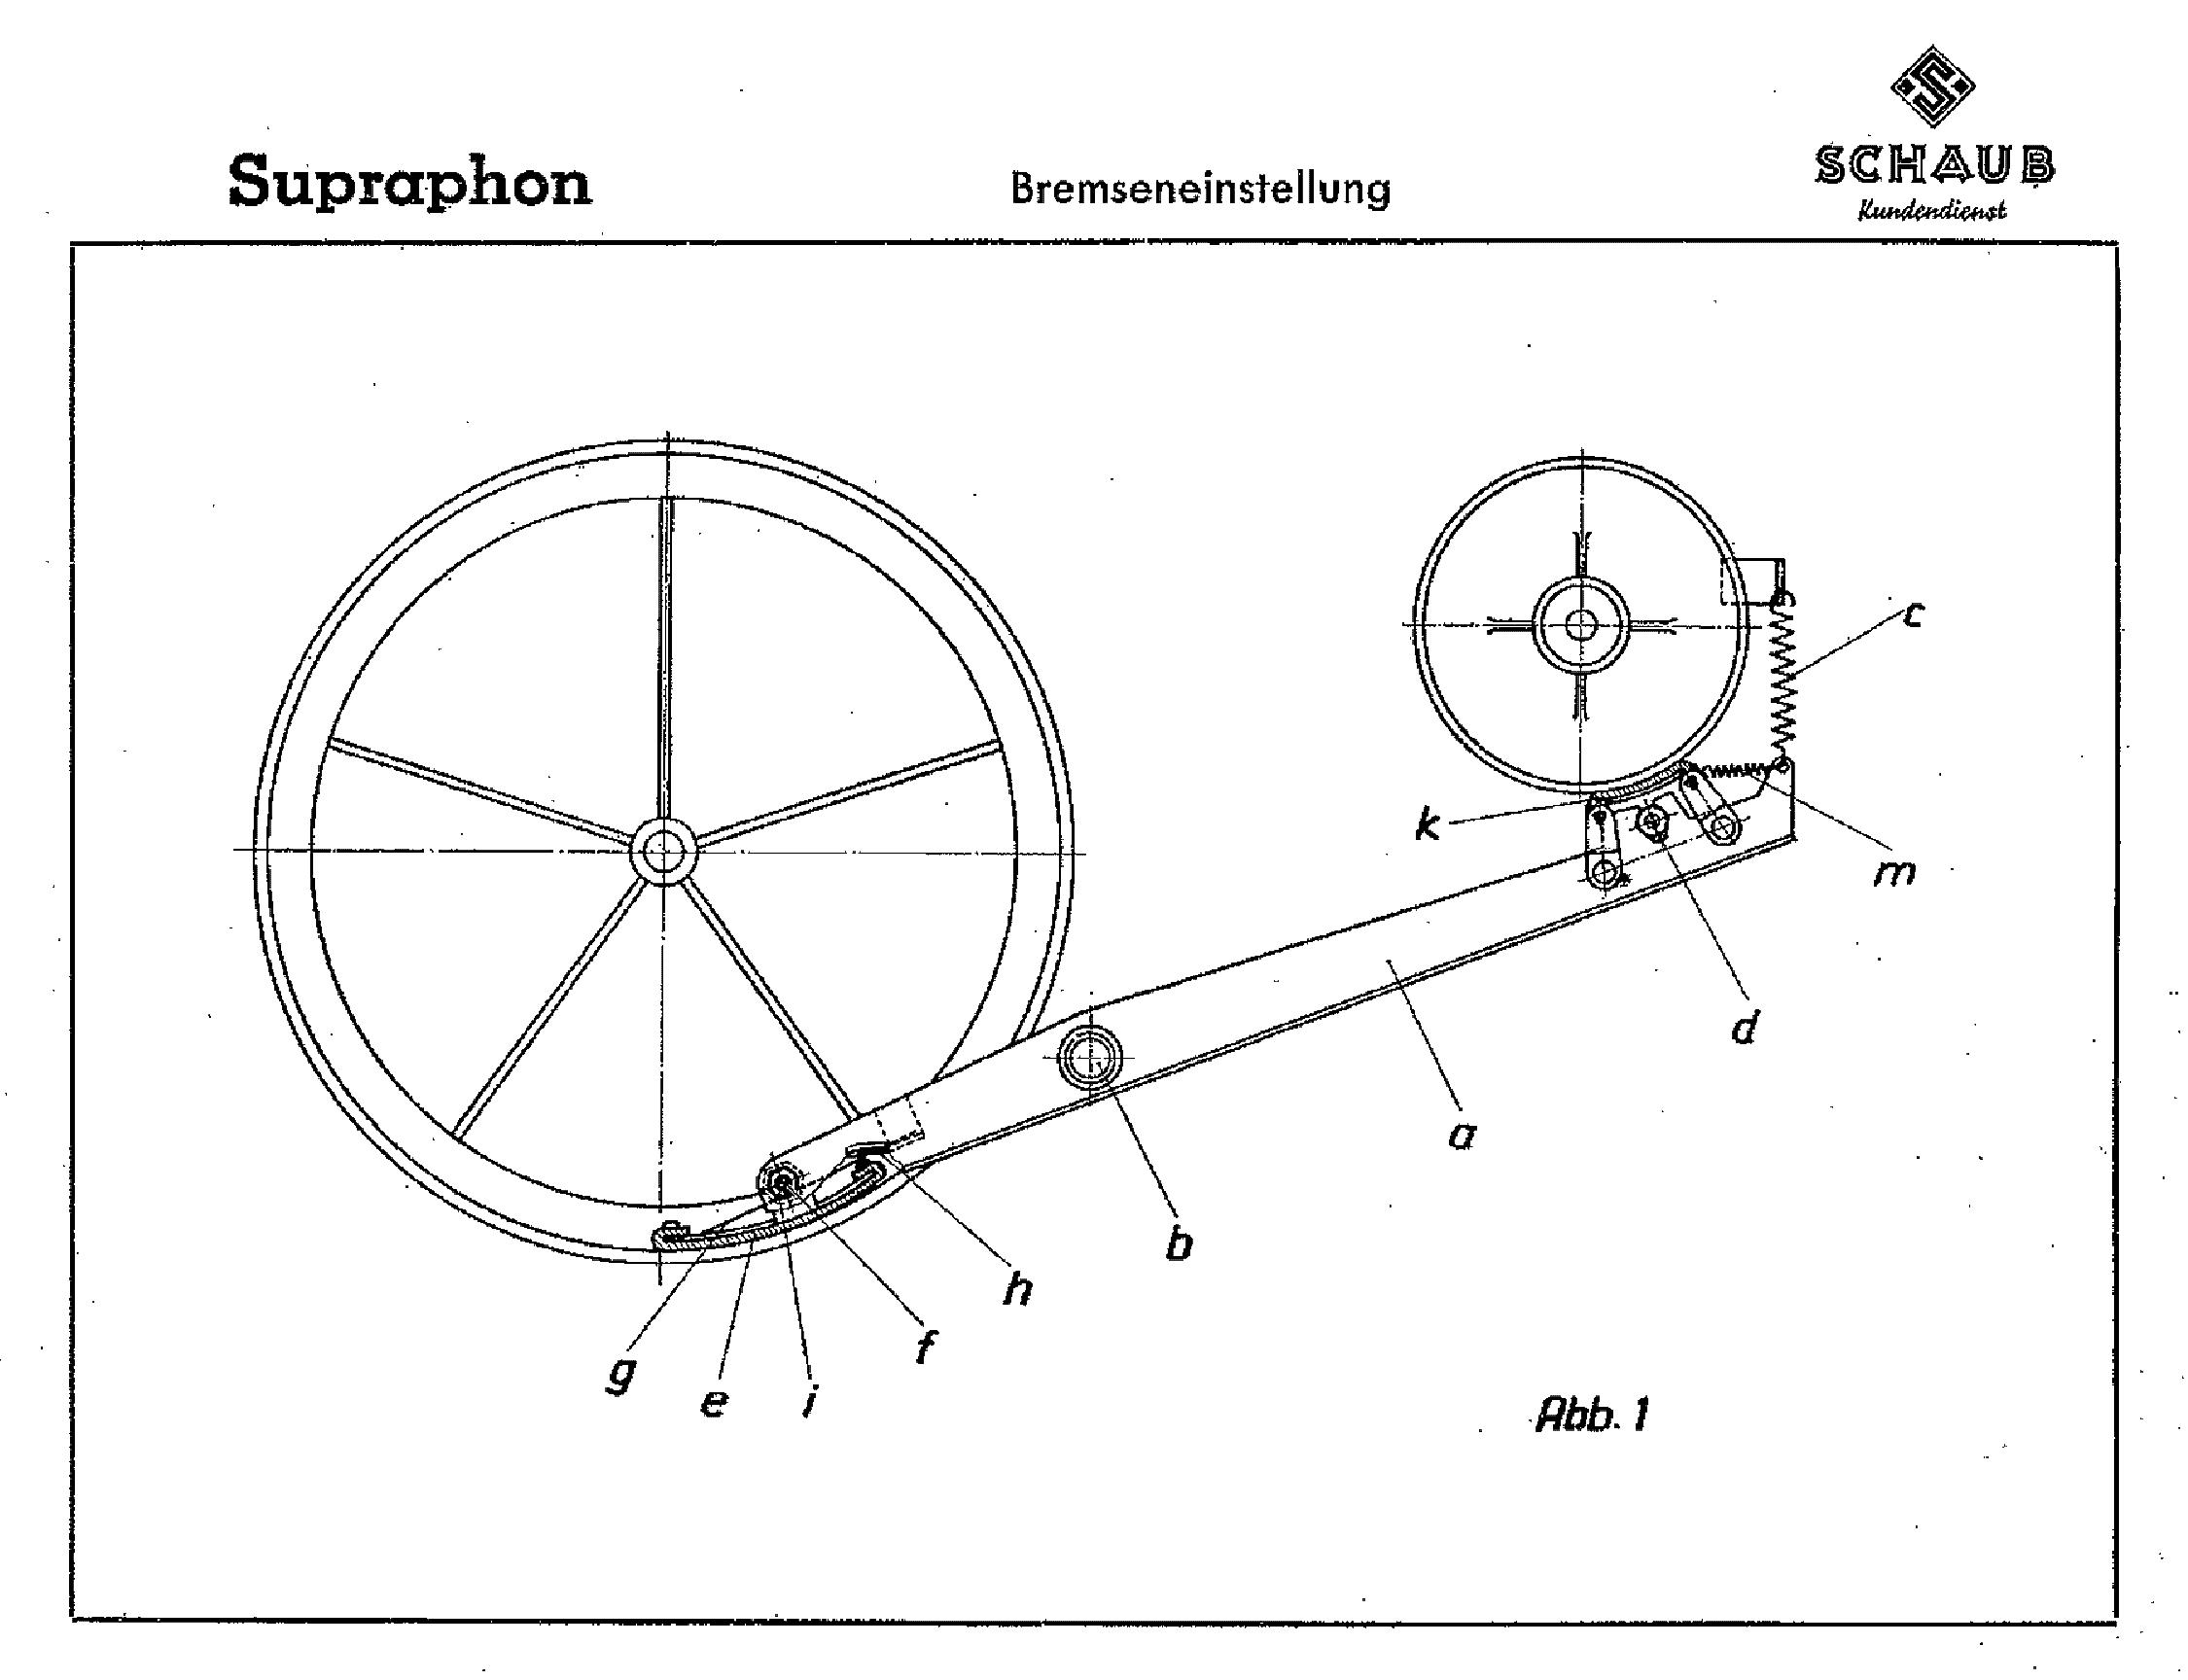 SCHAUB-LORENZ SUPRAPHONE-53 AM-FM RADIO GRAMOPHONE SM